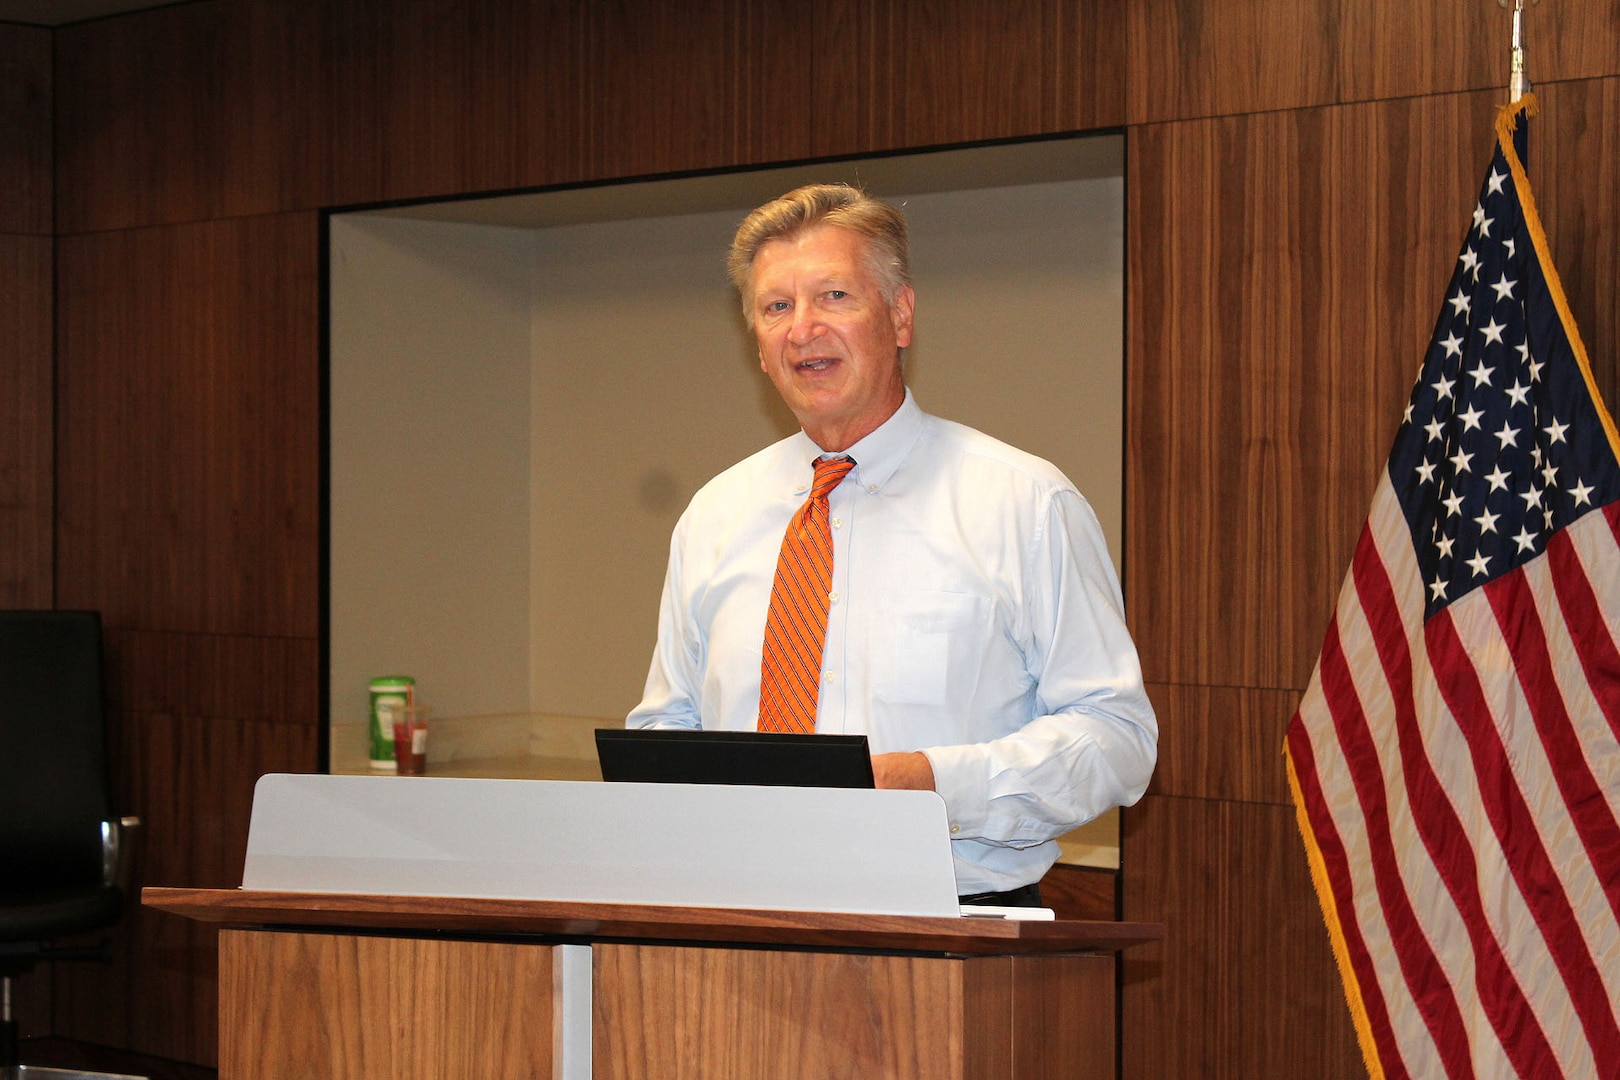 A man speaks at a podium.